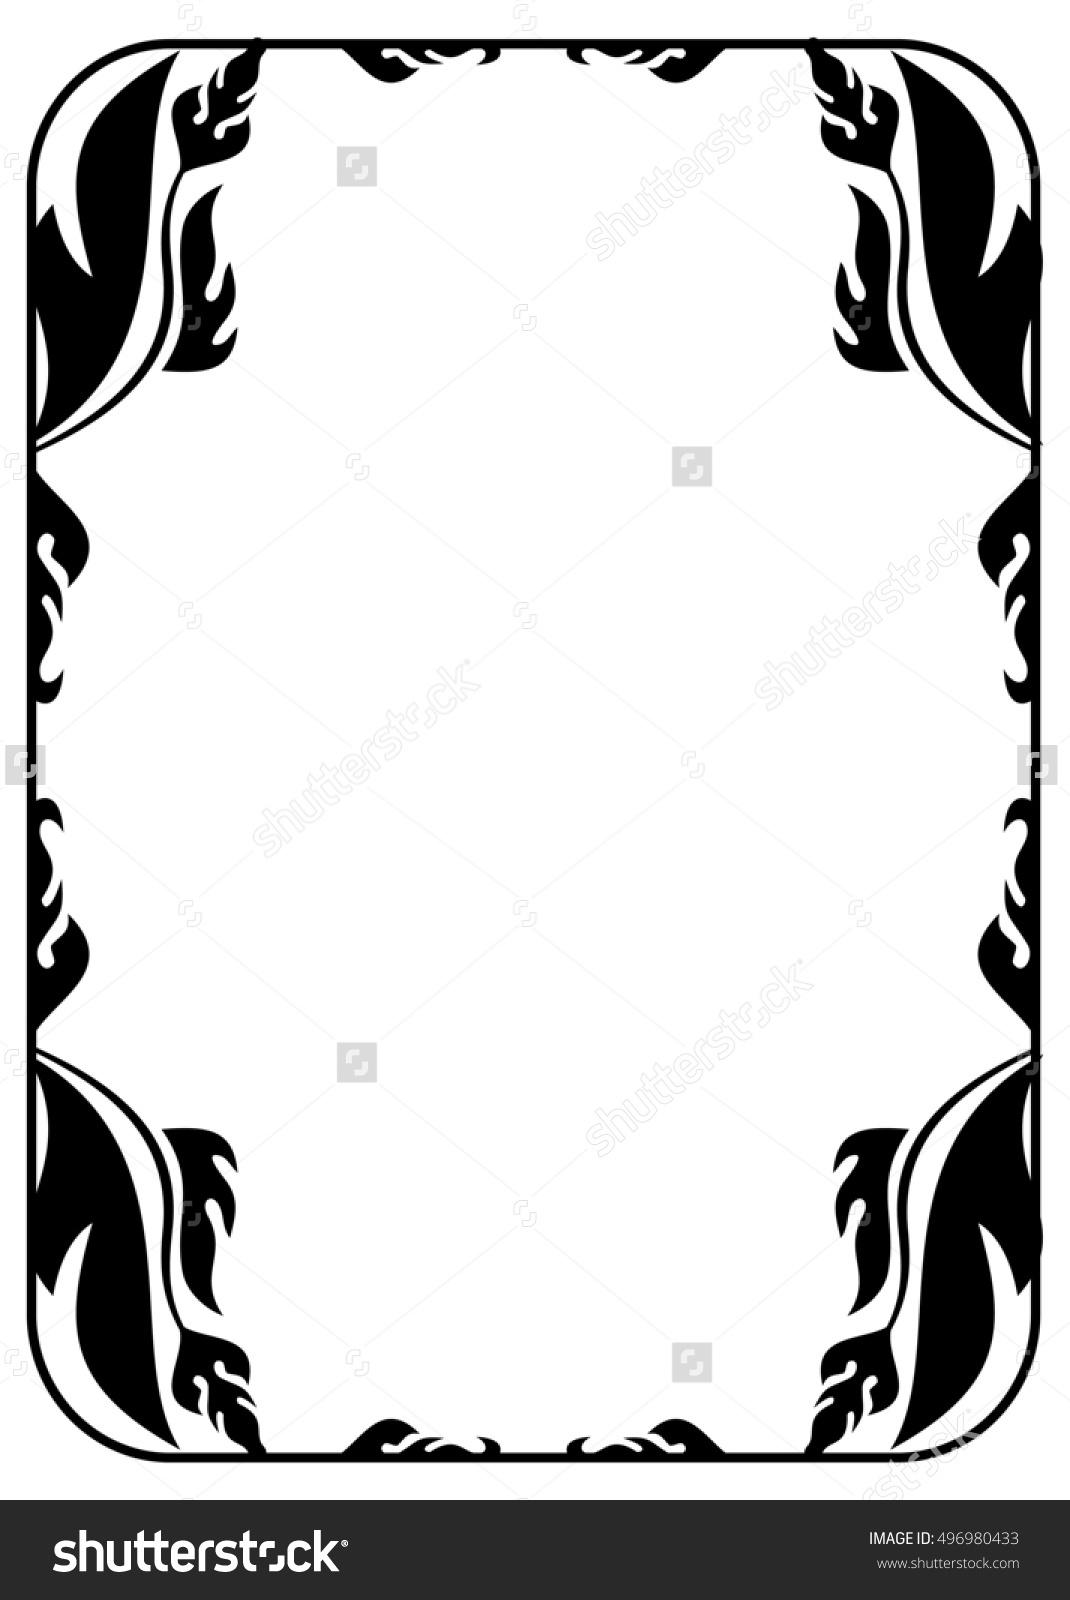 Black White Floral Silhouette Vertical Frame Stock Illustration.